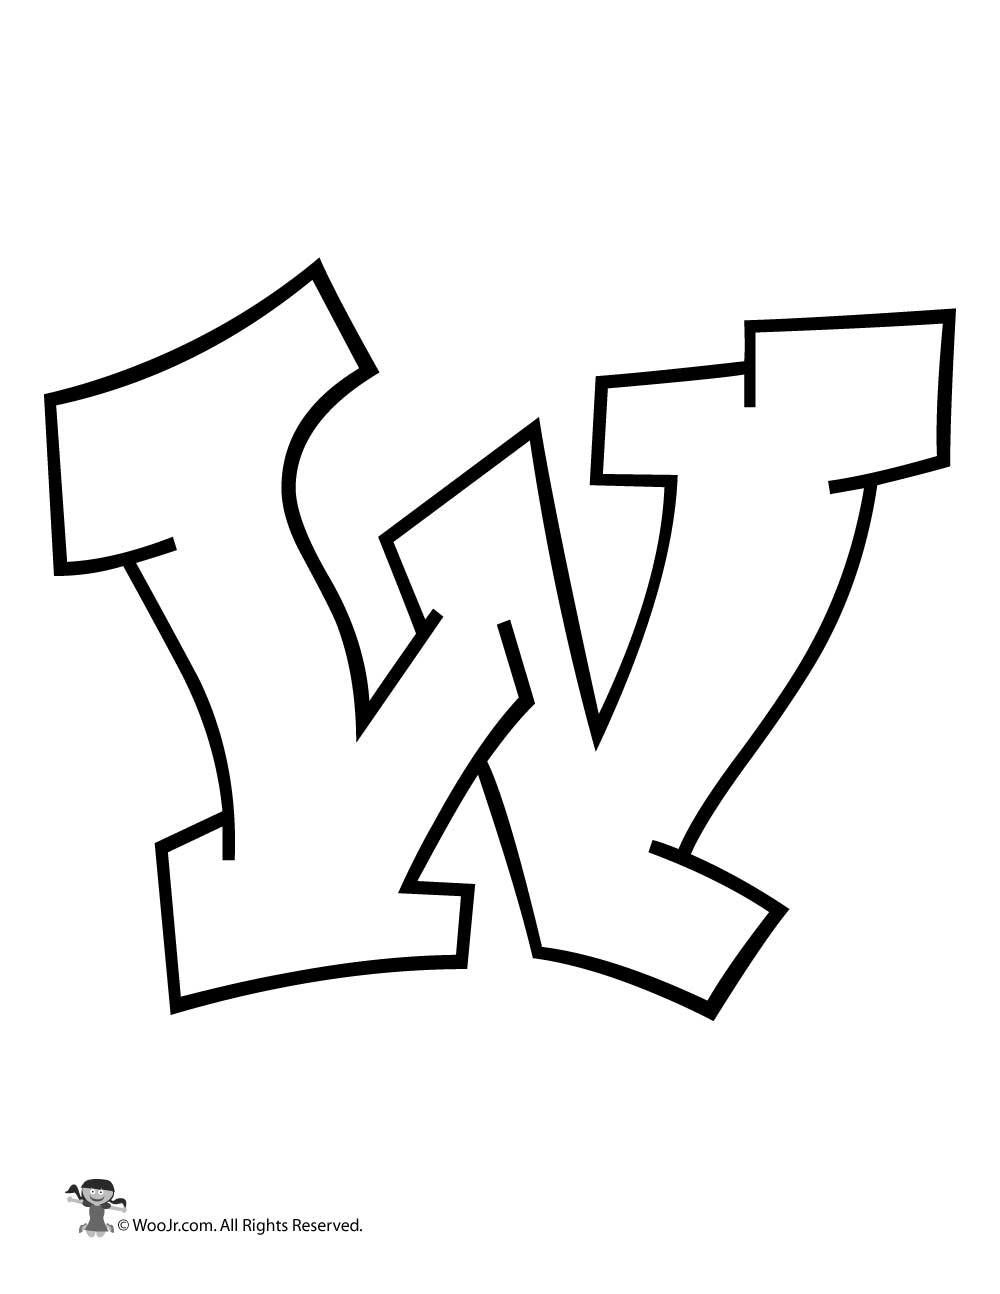 Graffiti Capital Letter W | Woo! Jr. Kids Activities